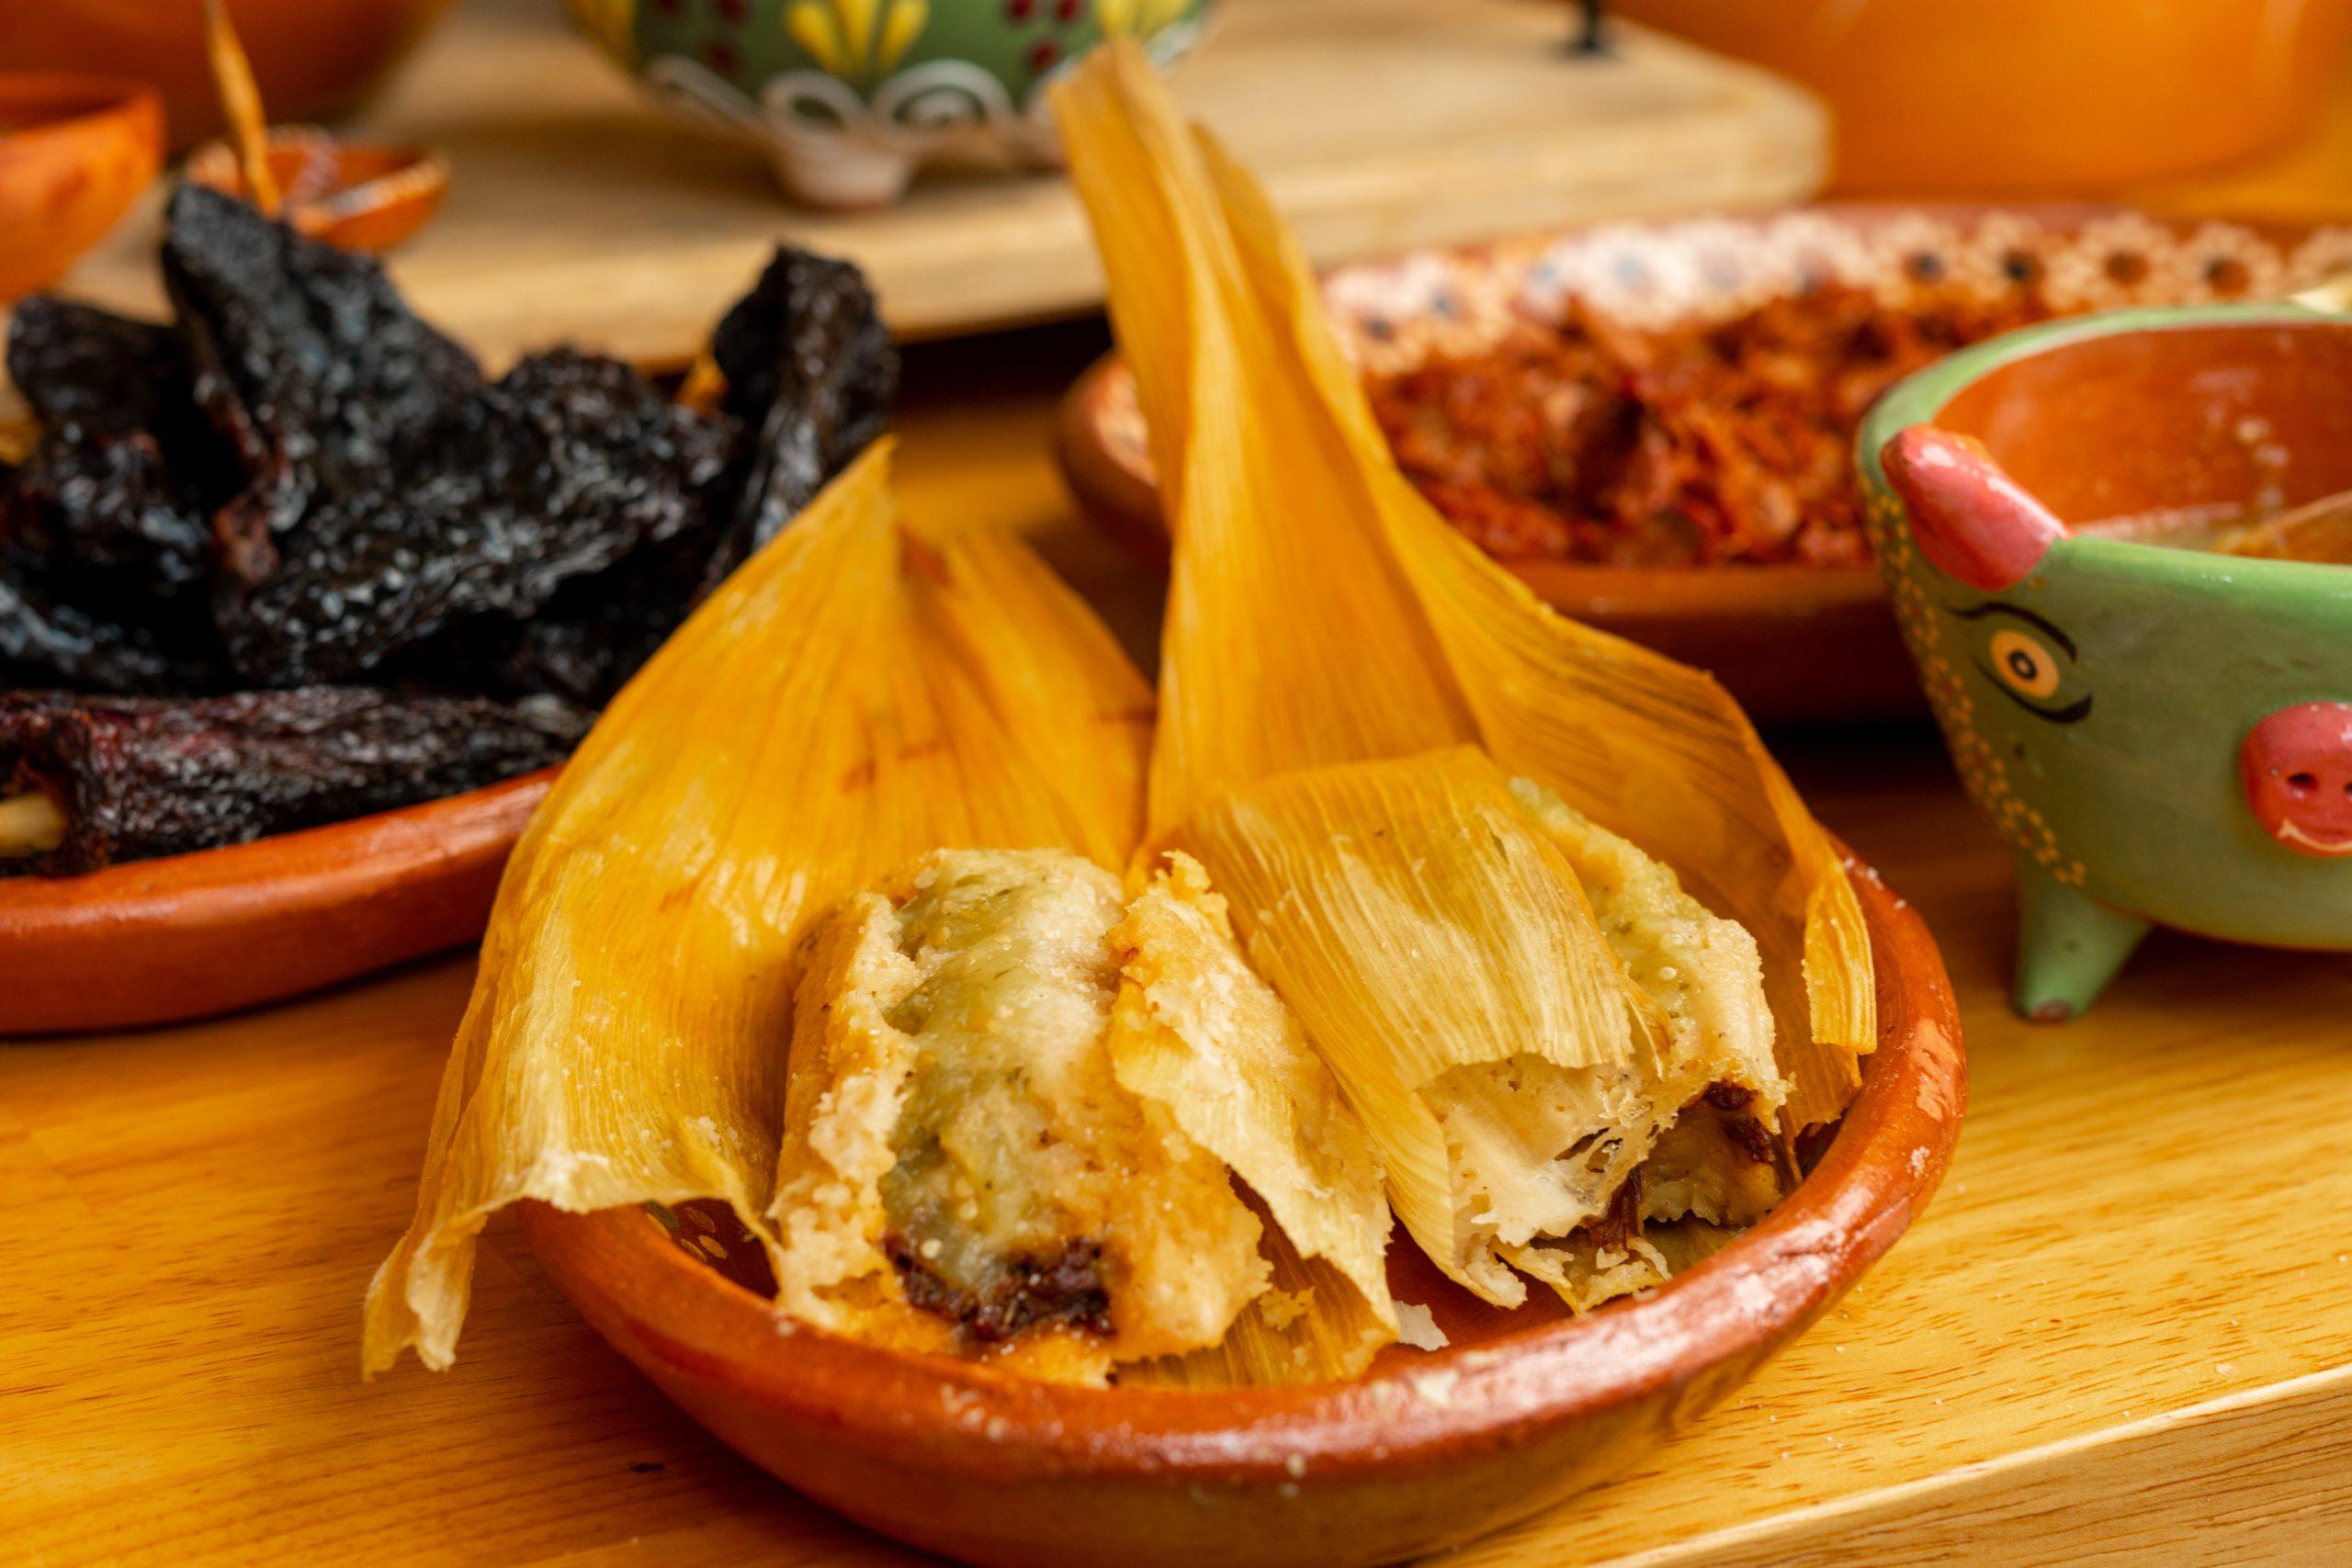 tisp on making tamales at home